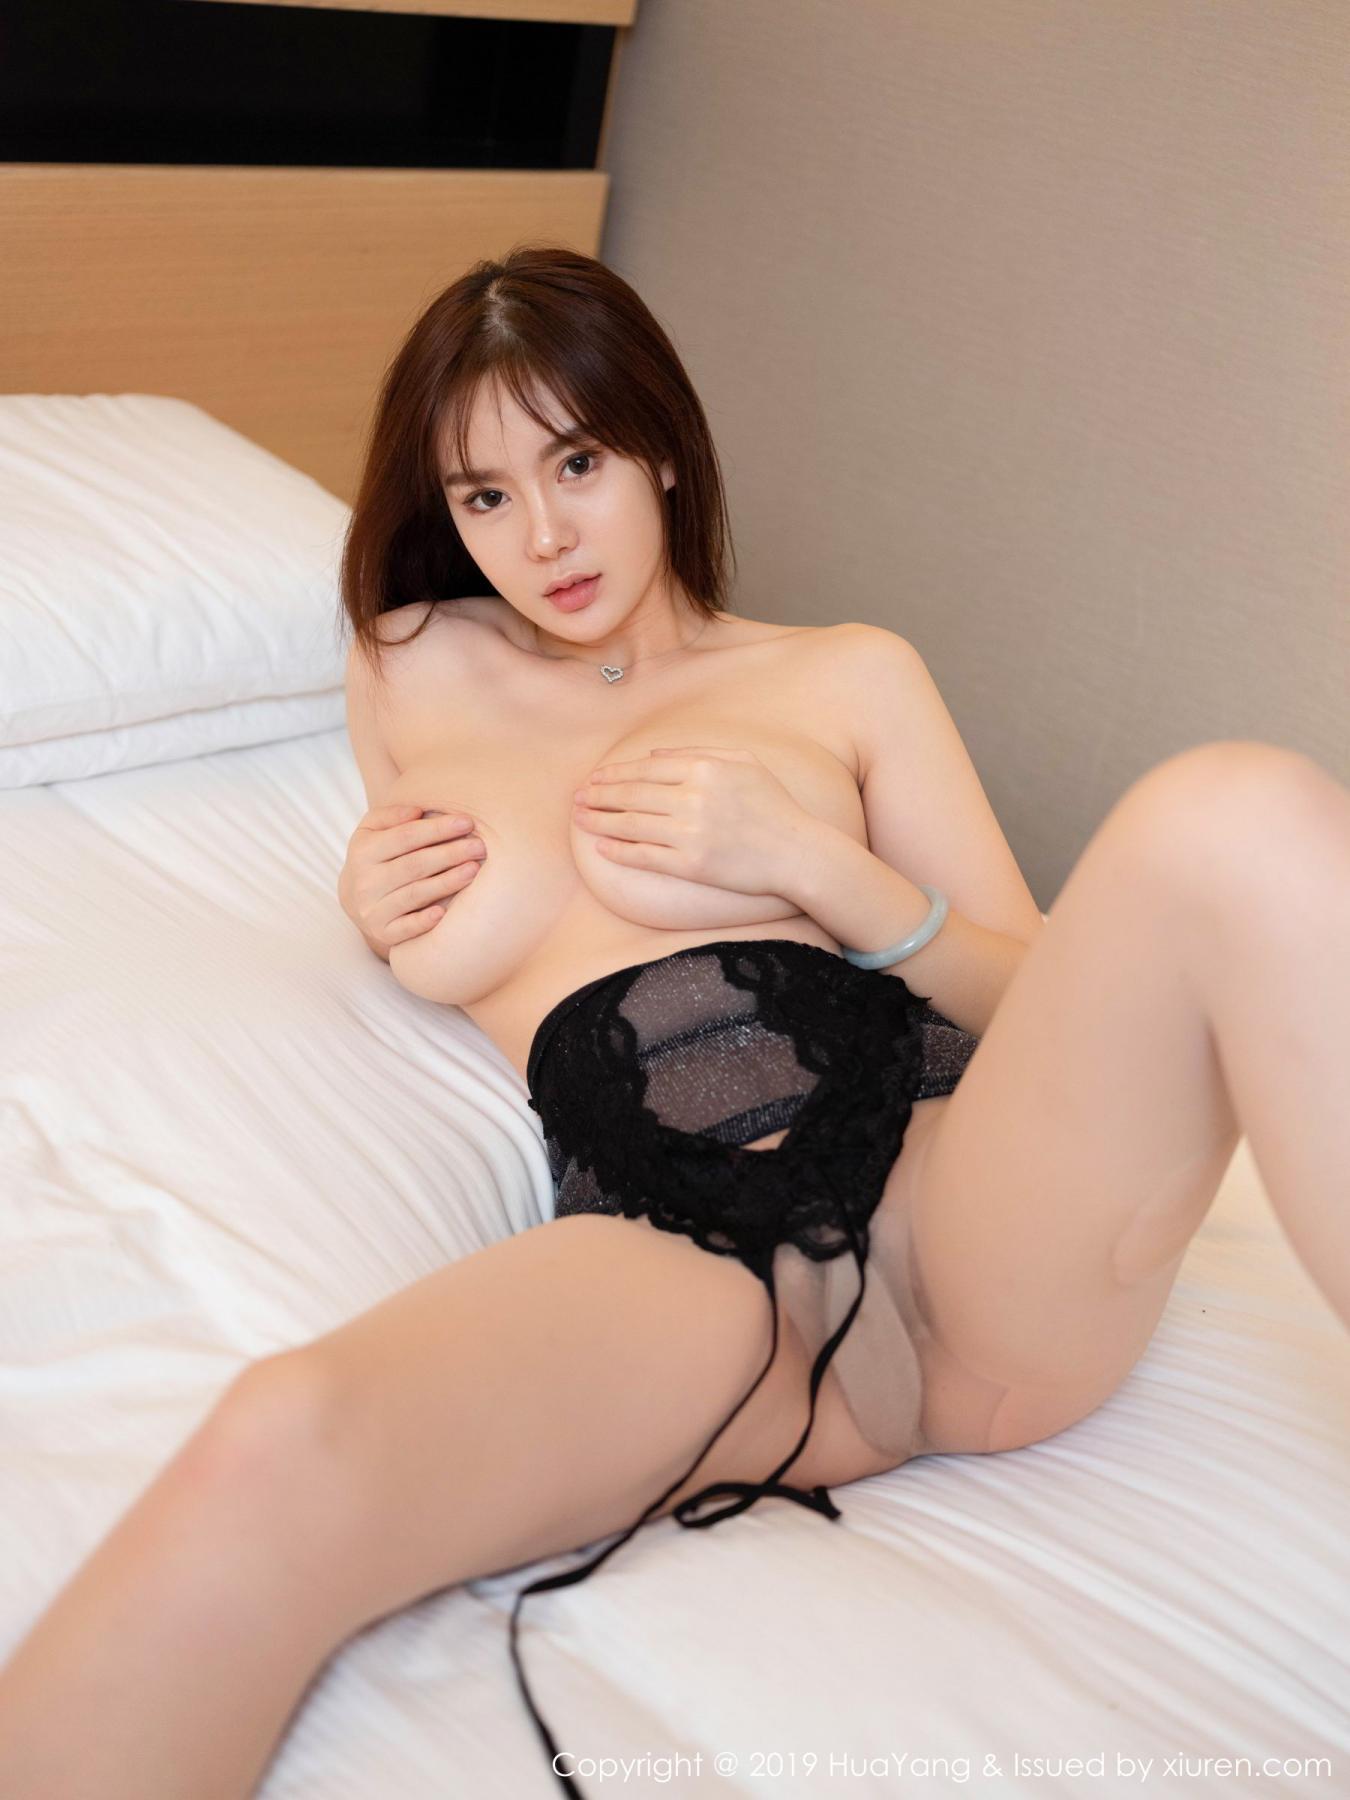 [Huayang] Vol.128 Yi Yang 43P, Adult, HuaYang, Yi Yang